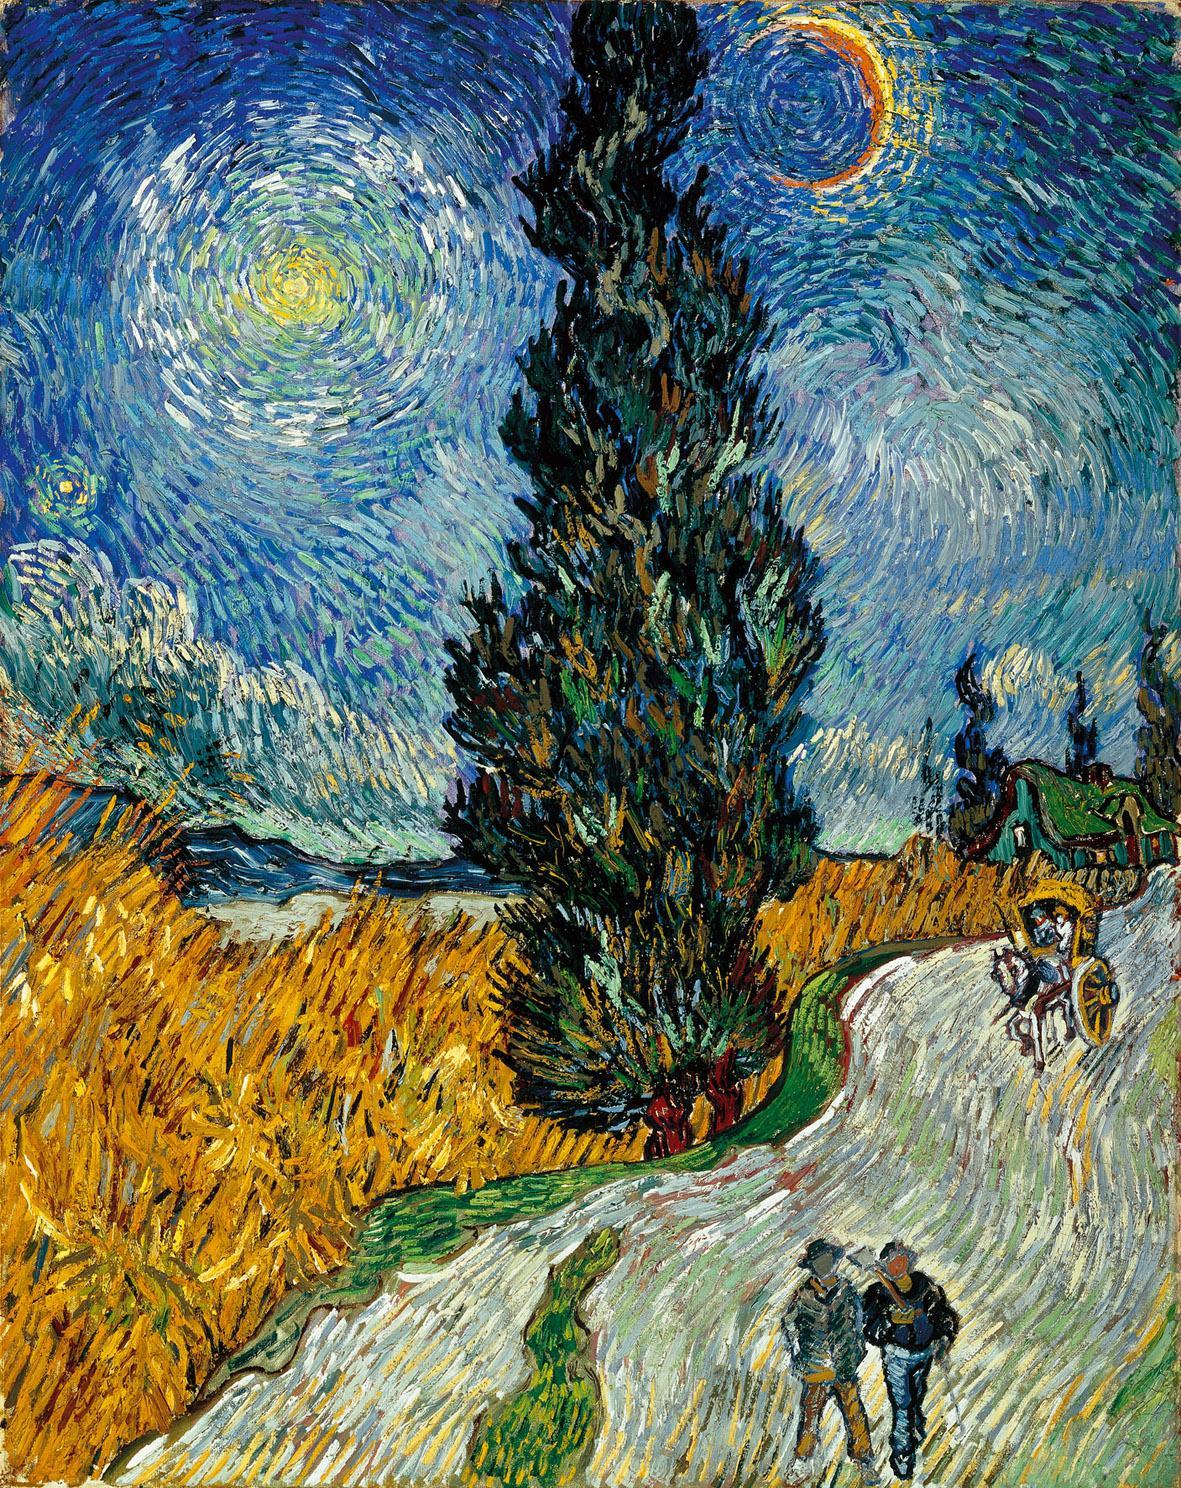 Vincent van Gogh, Sentiero di notte in Provenza, 1890 olio su tela, cm 90,6 x 72 Otterlo, Kröller-Müller Museum